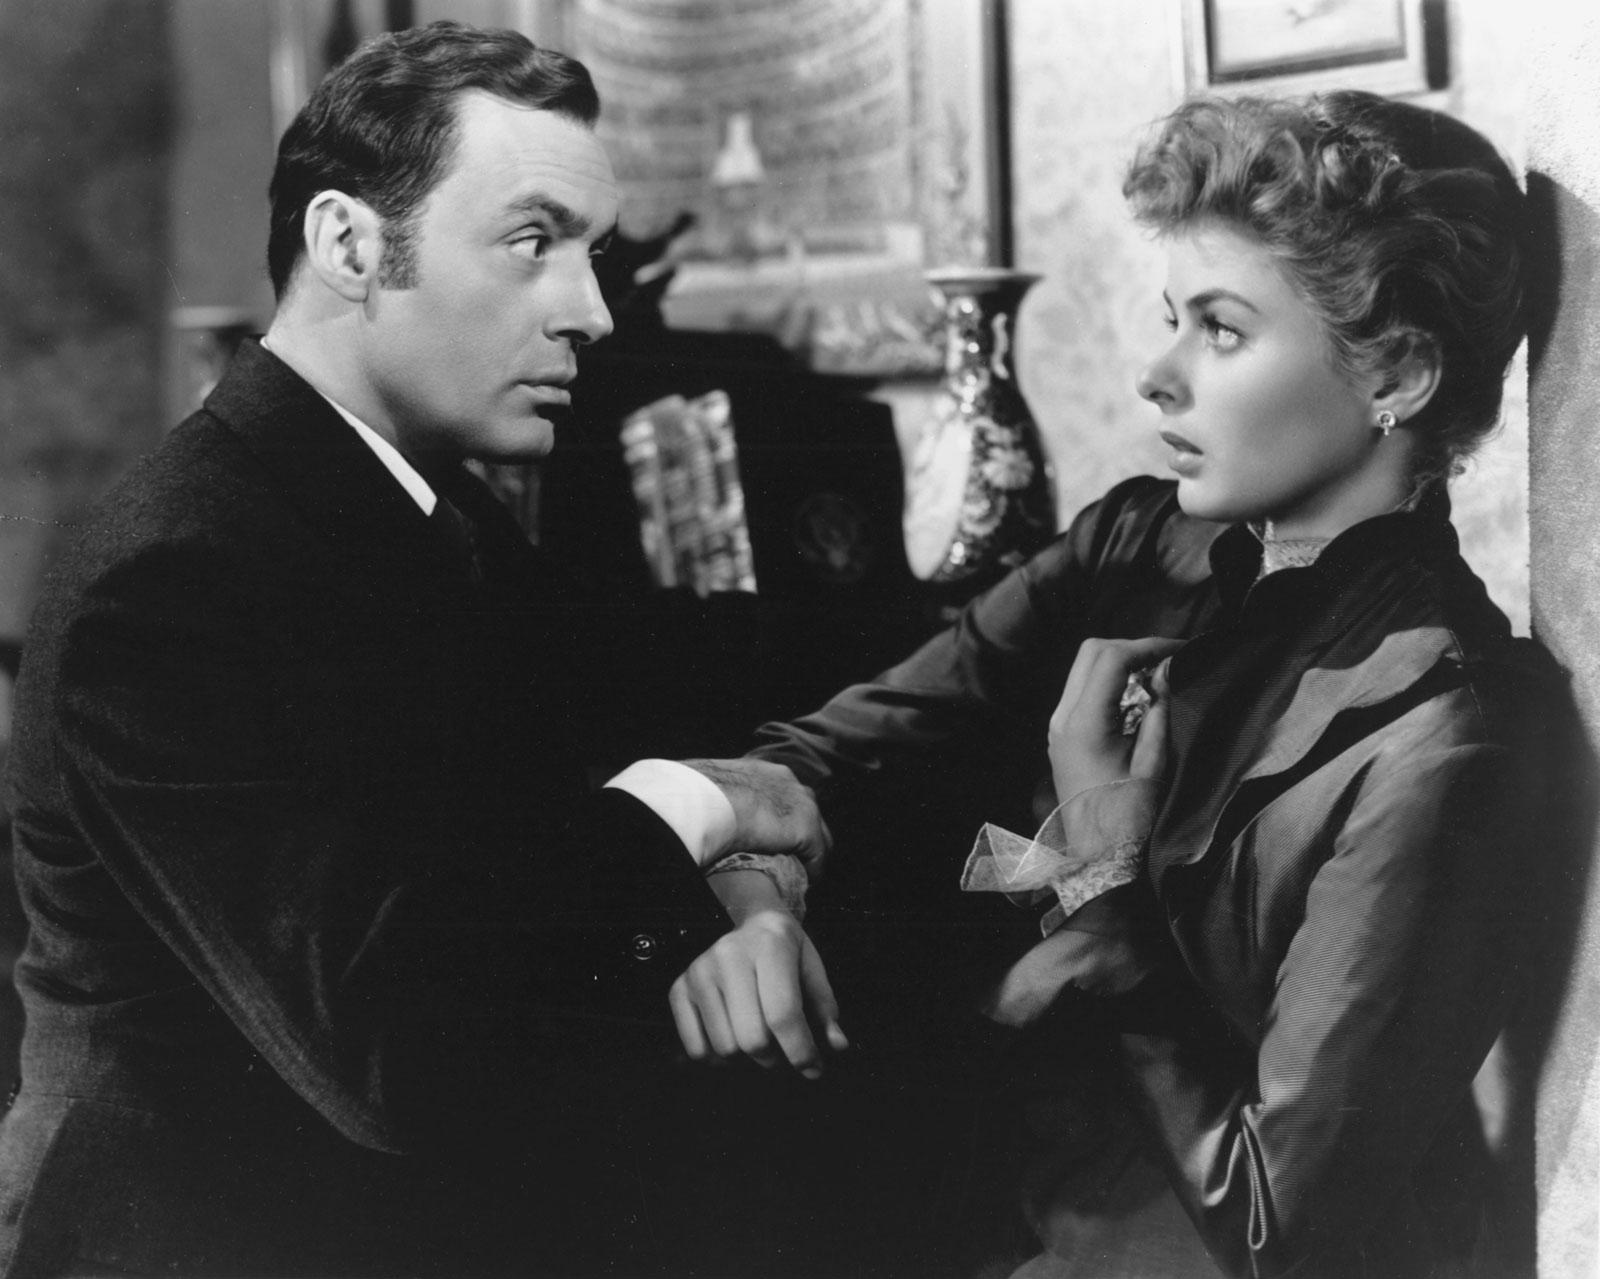 Charles Boyer and Ingrid Bergman in Gaslight